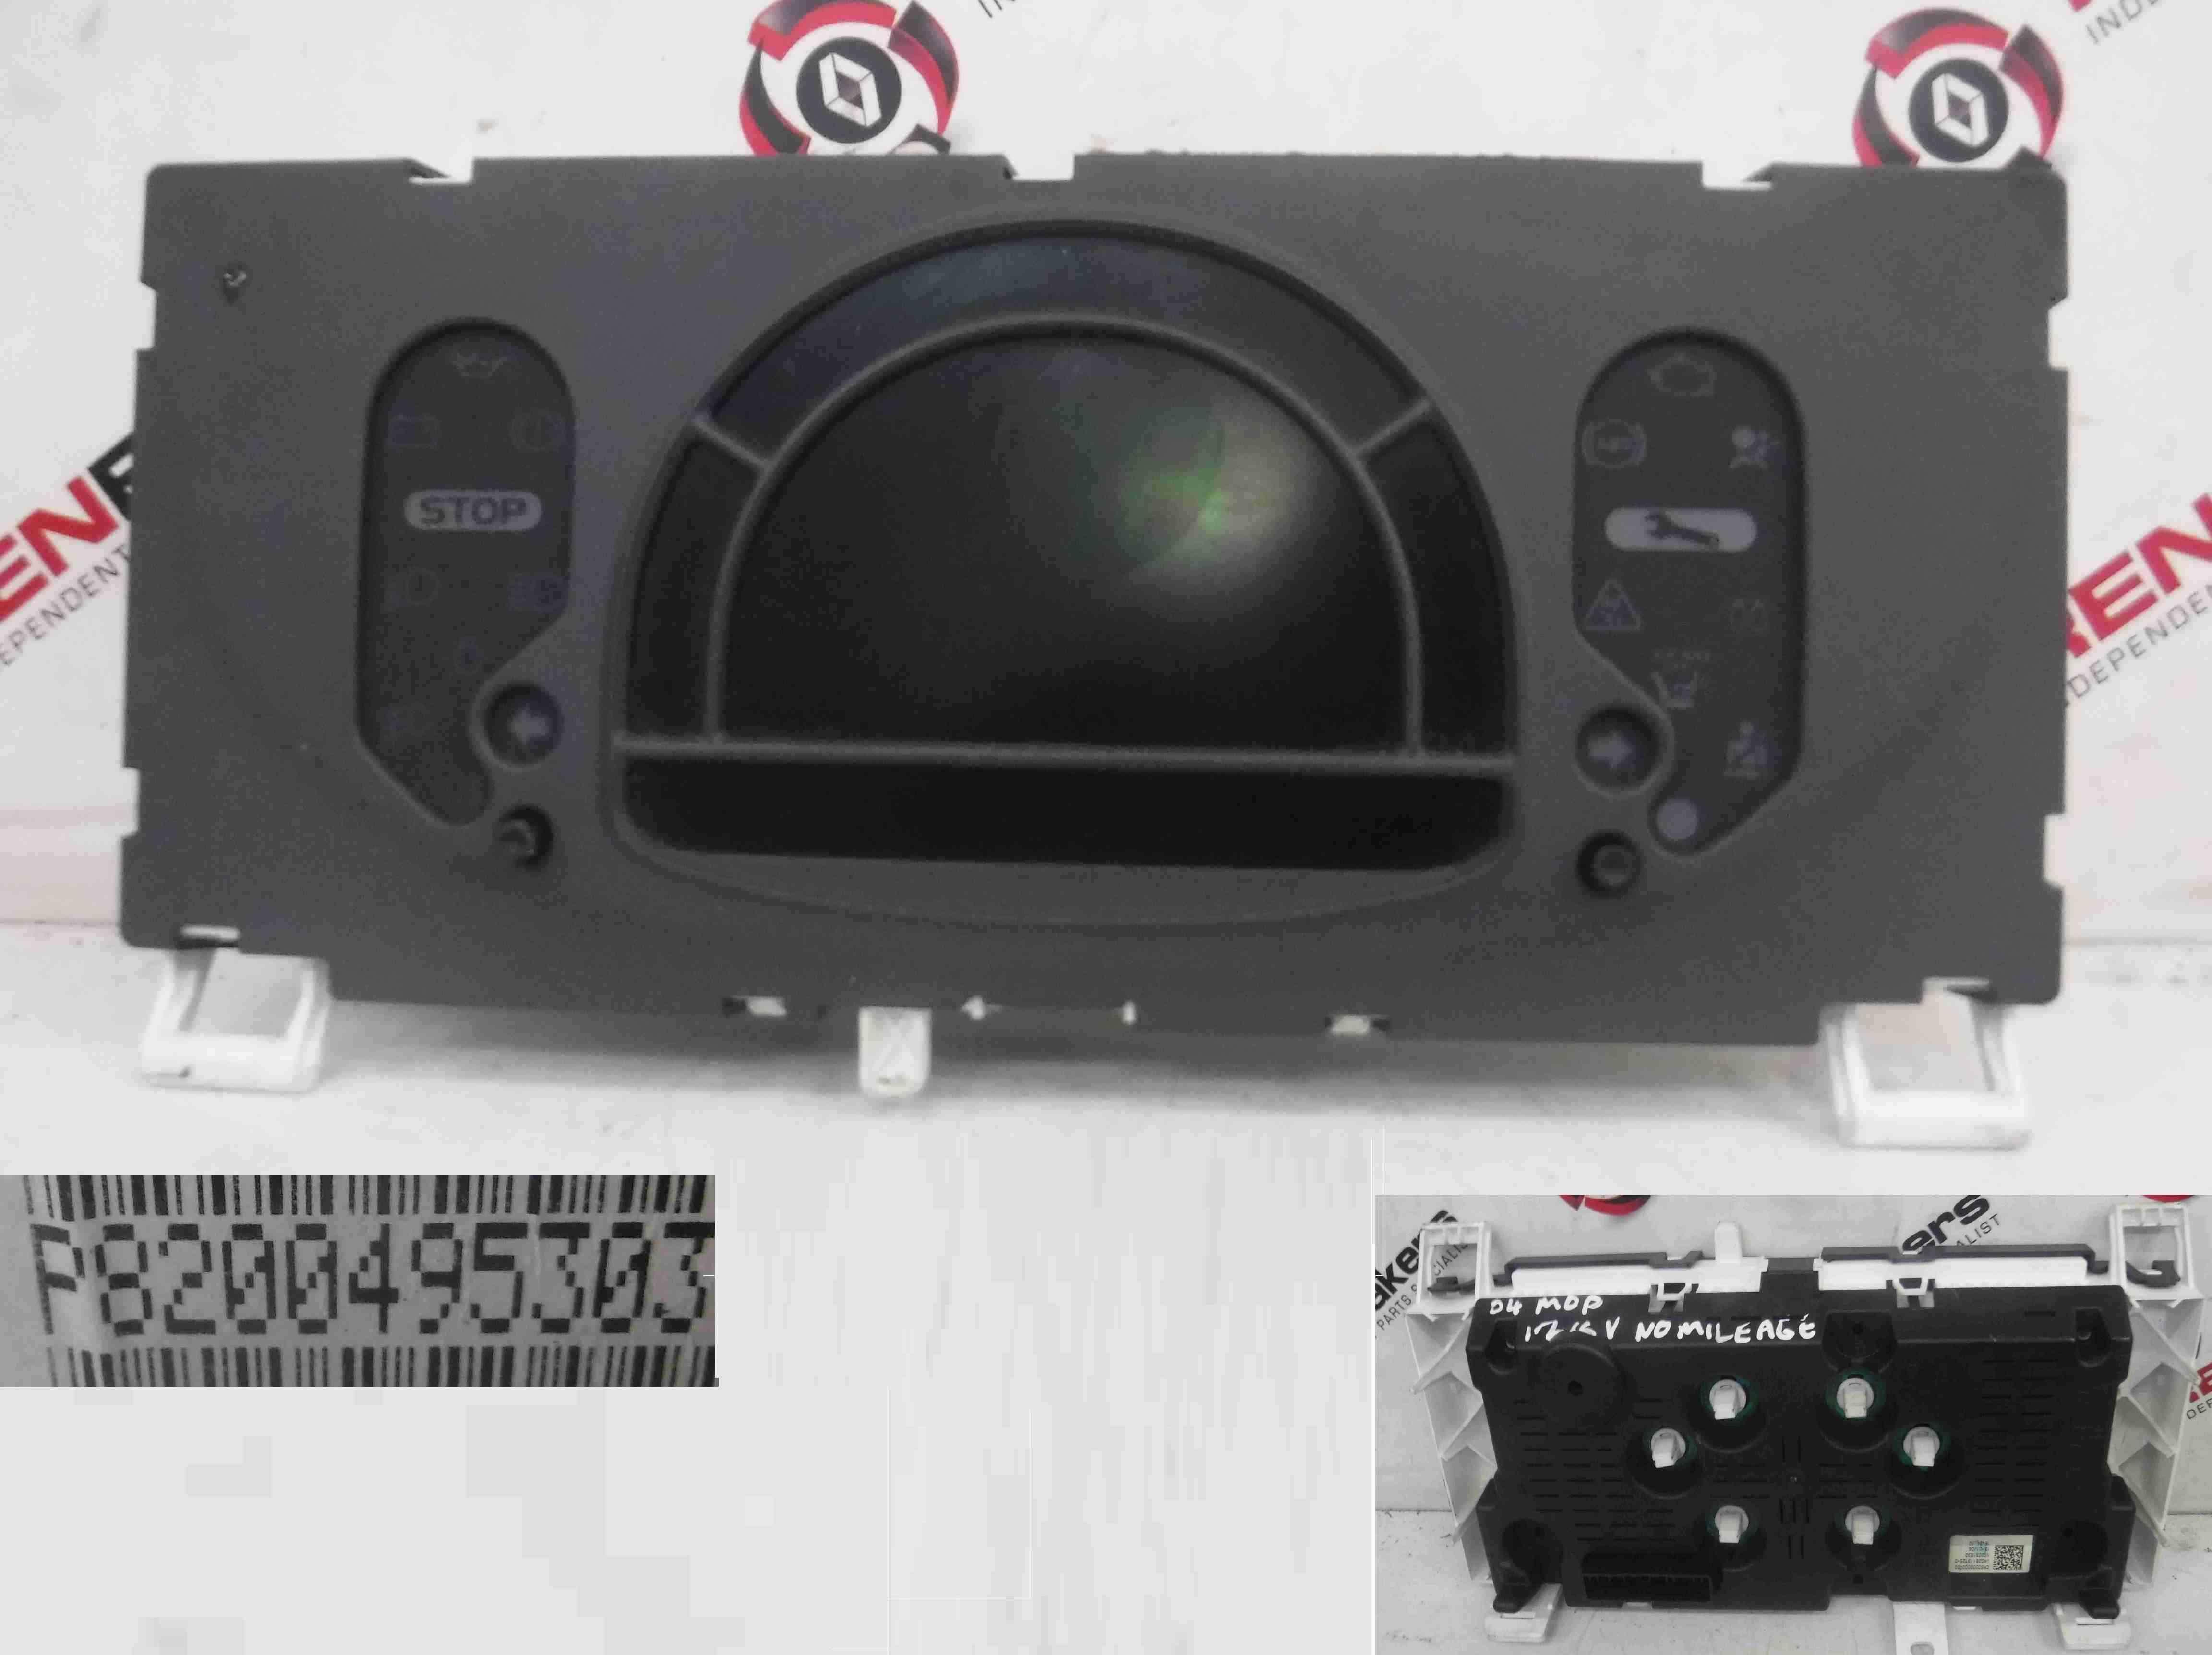 Renault Modus 2004-2008 Instrument Panel Dials Clocks Display 8200495303